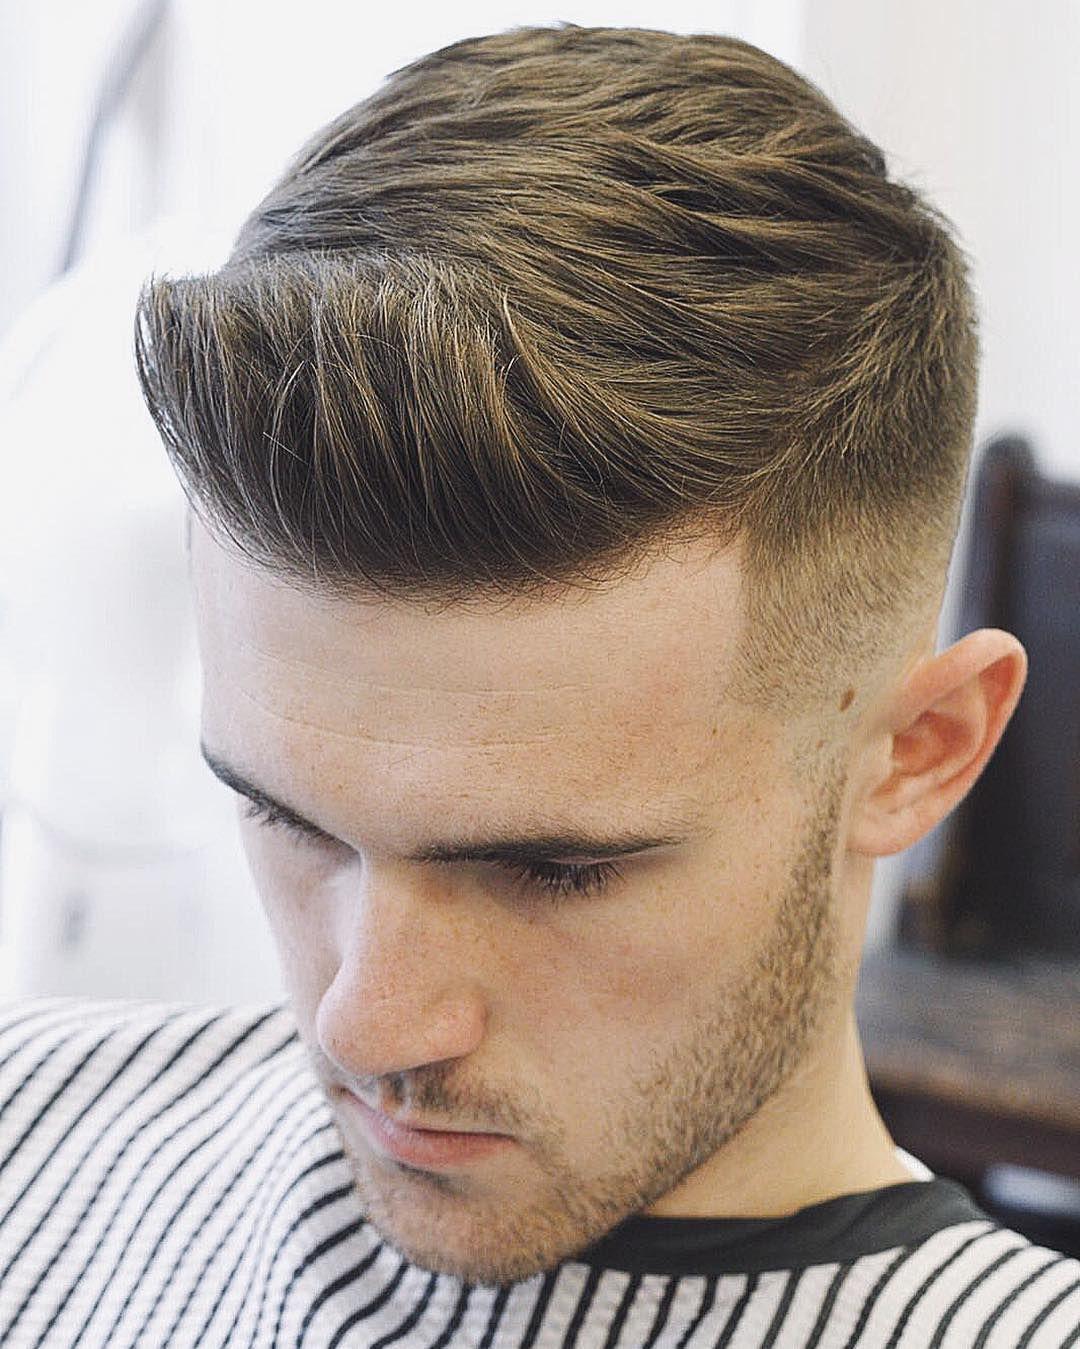 40 new hairstyles for men 2018 | men hairstyles 2018 | pinterest